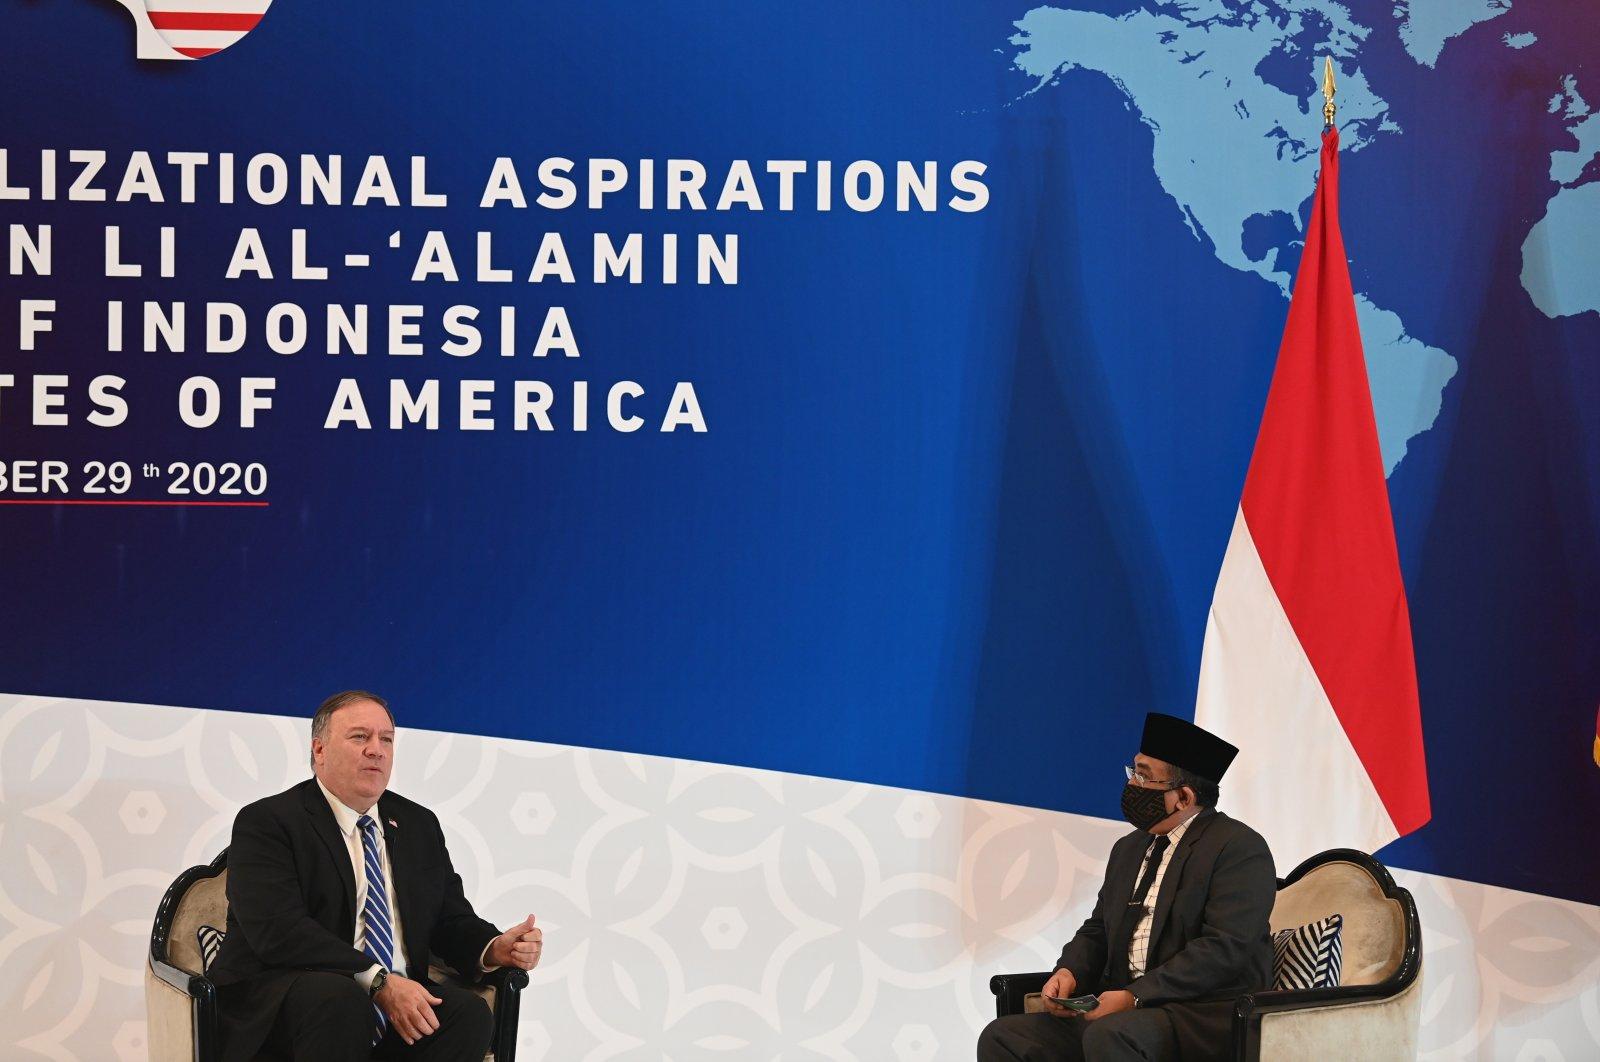 U.S. Secretary of State Mike Pompeo (L) and General Secretary of Nahdlatul Ulama Yahya Cholil Staquf hold a discussion at the Nahdlatul Ulama in Jakarta, Oct. 29, 2020. (AP Photo)